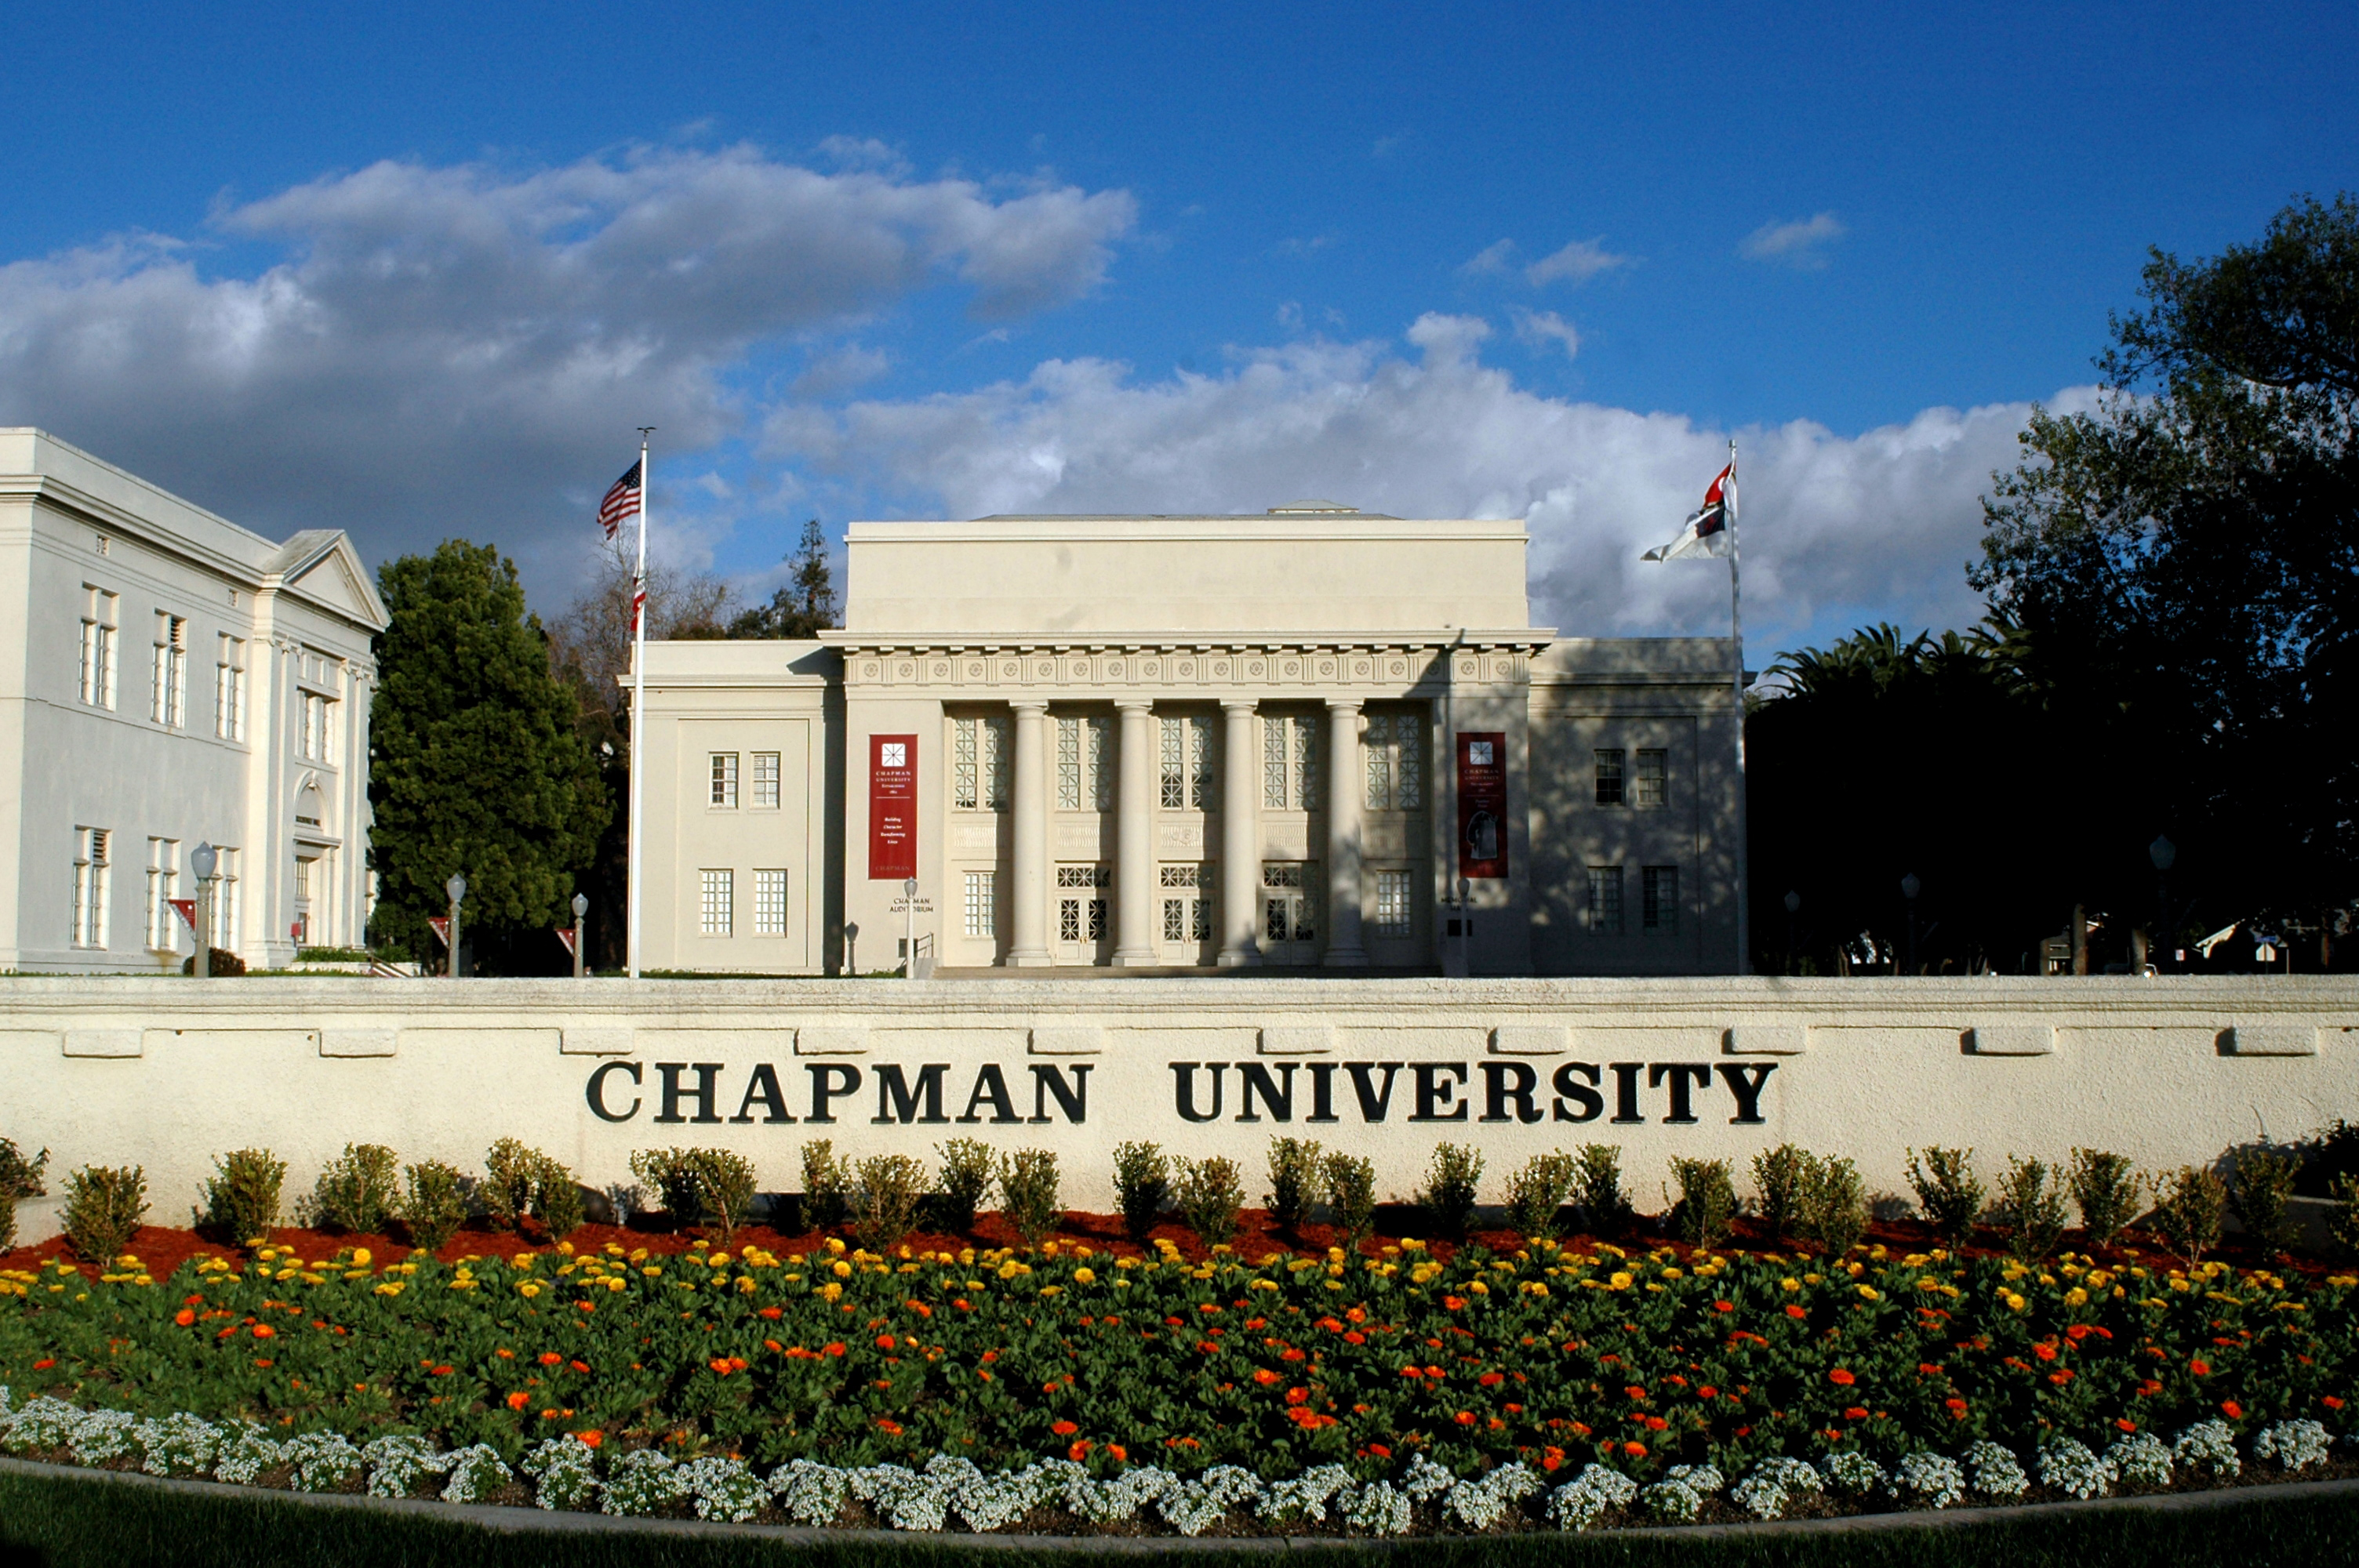 Chapman University Dorms